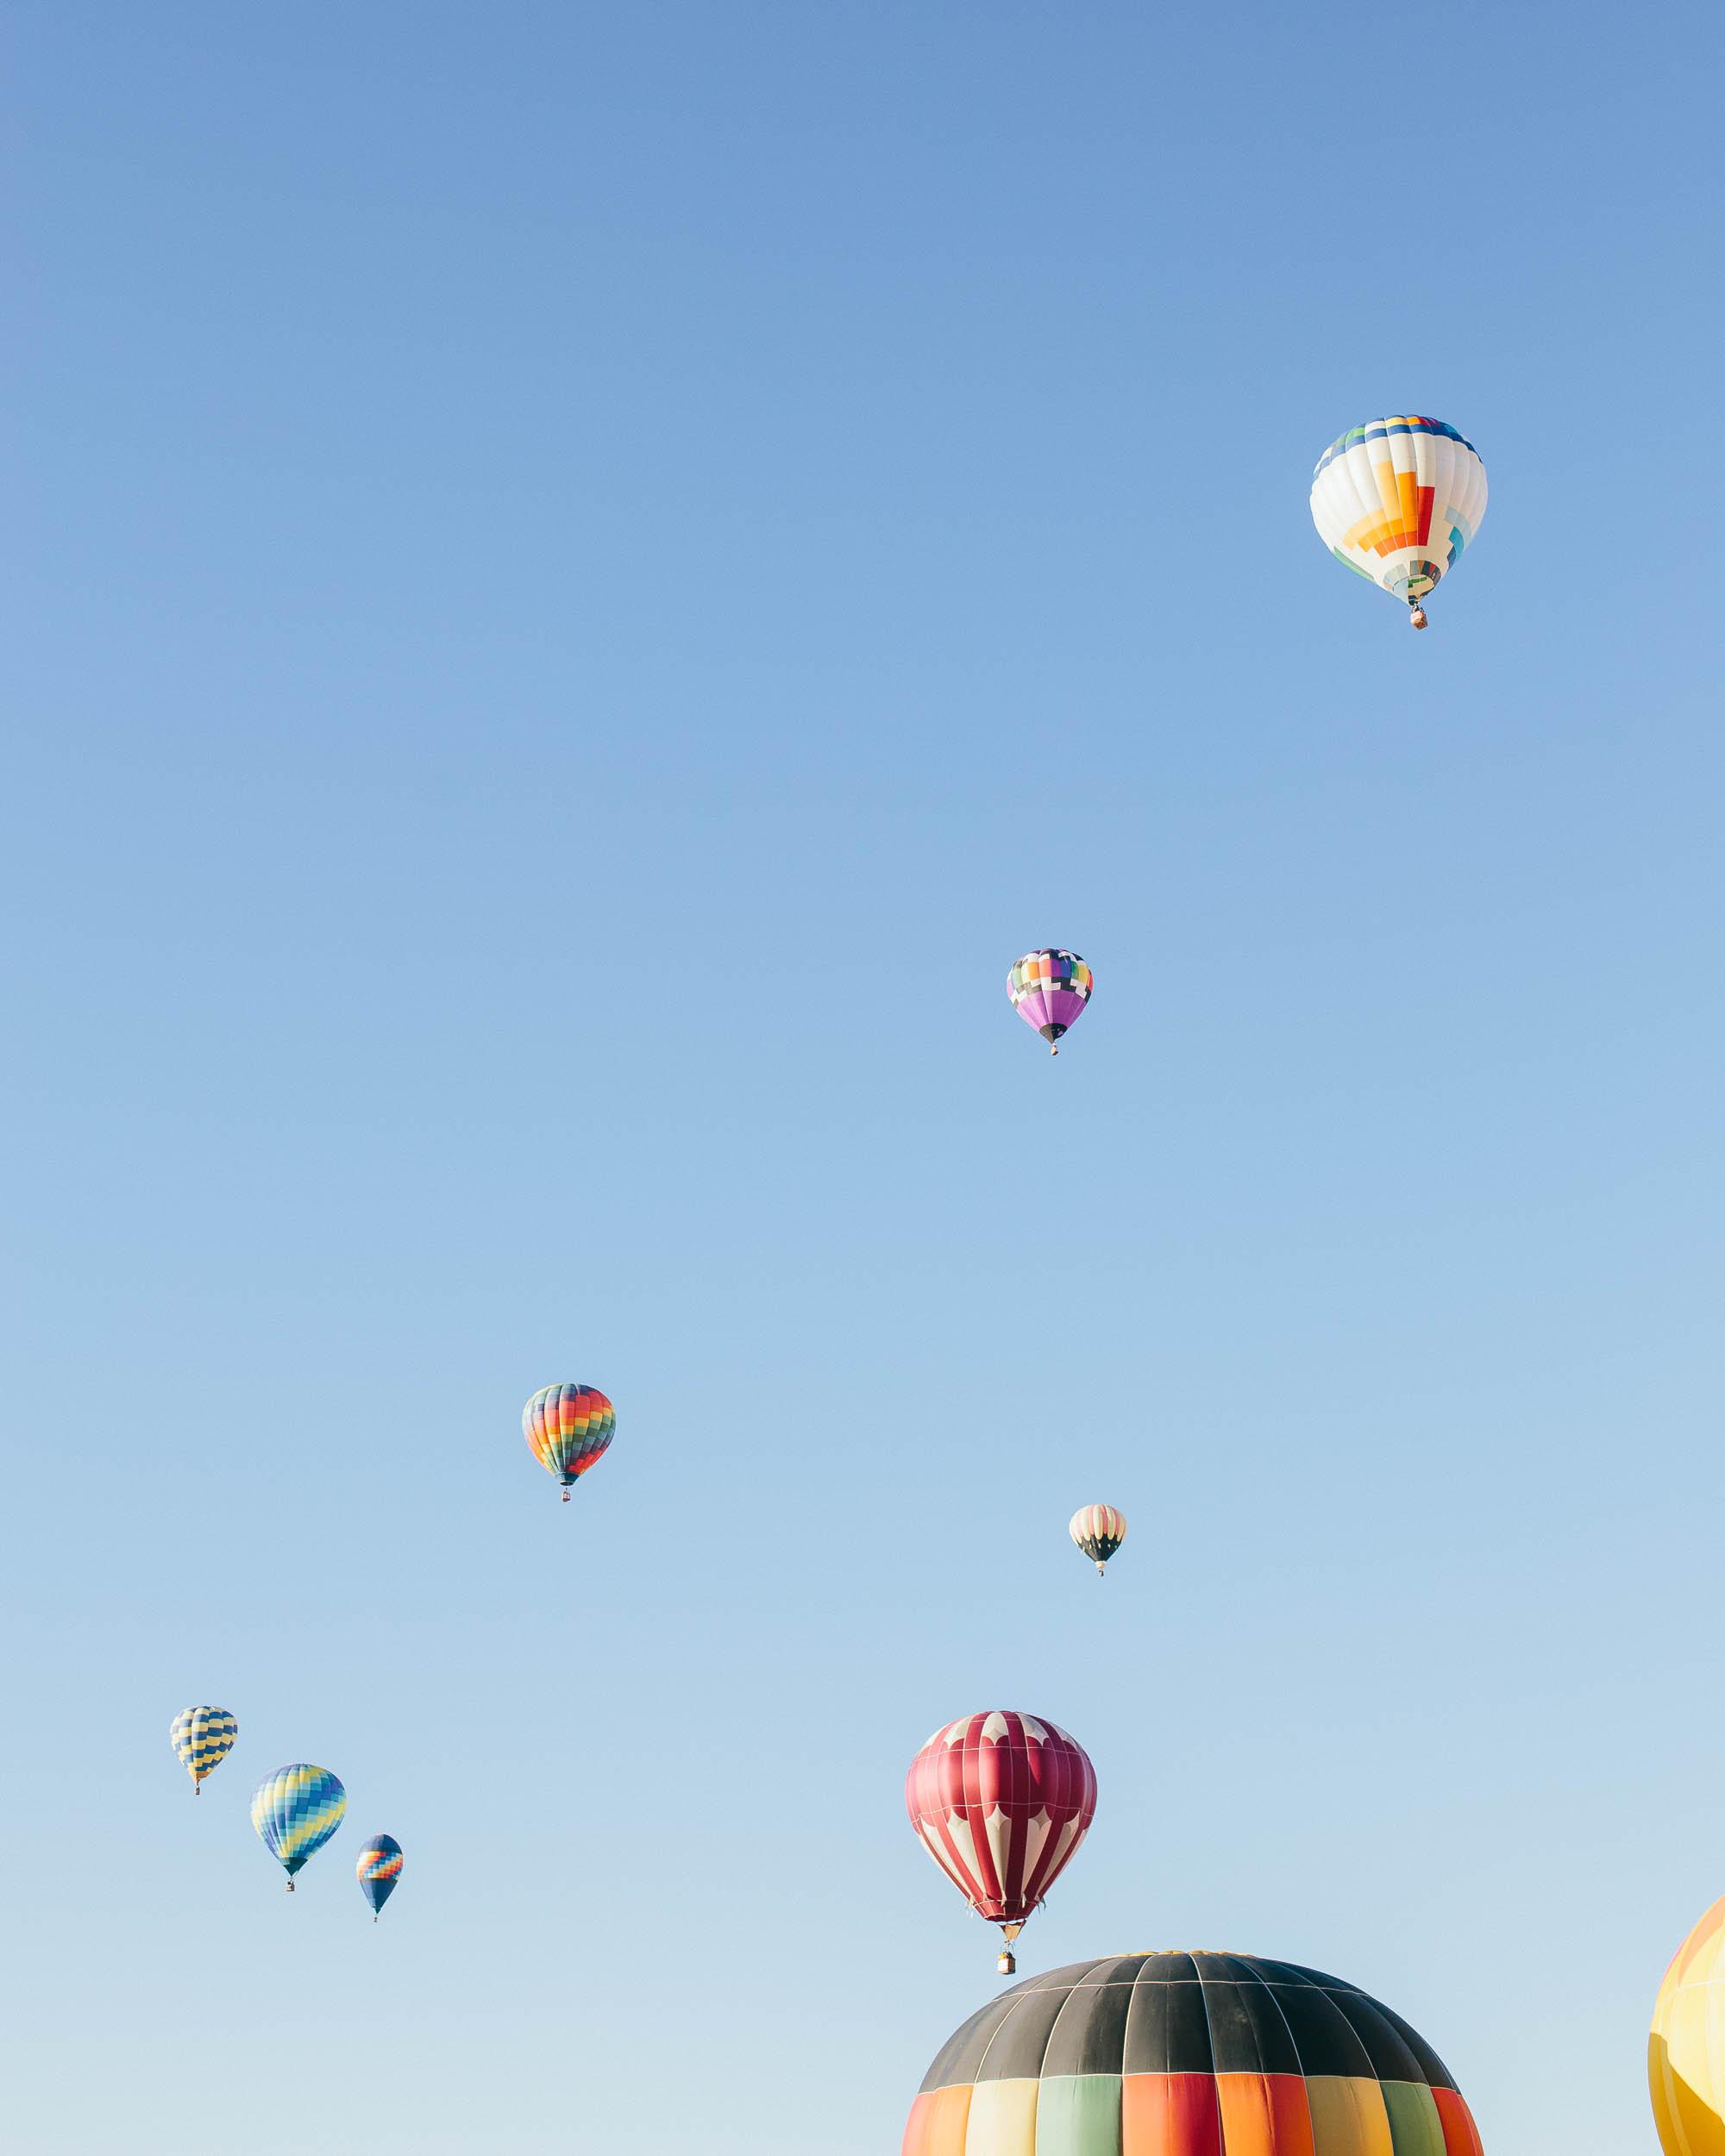 Kyle-Sheppard-Kanab-Balloon-Festival-19.jpg